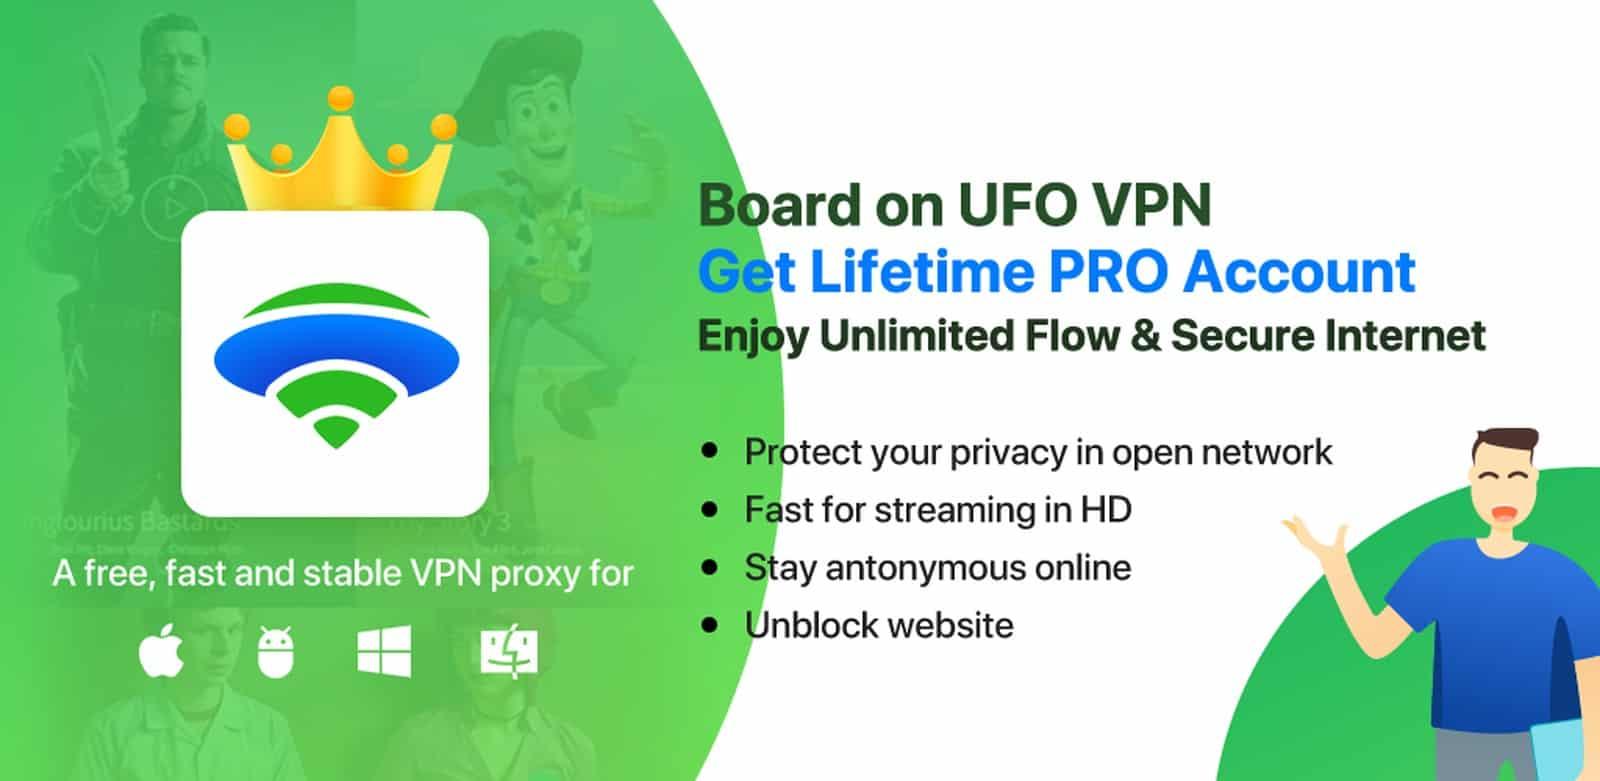 UFO VPN image 21